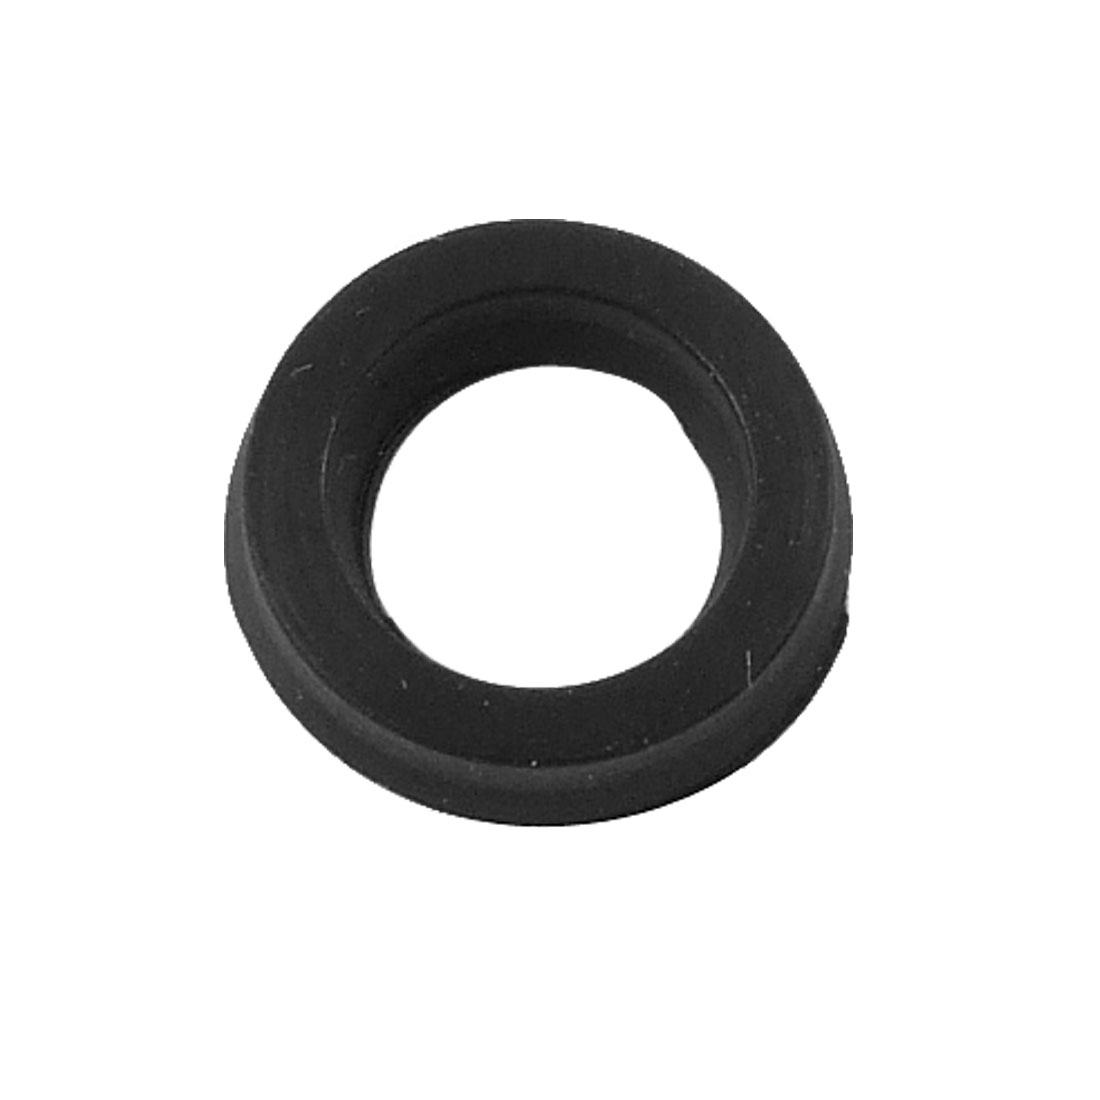 Air Cylinder Single Lip Pneumatic Seal MYA 6mm x 9mm x 2.1mm